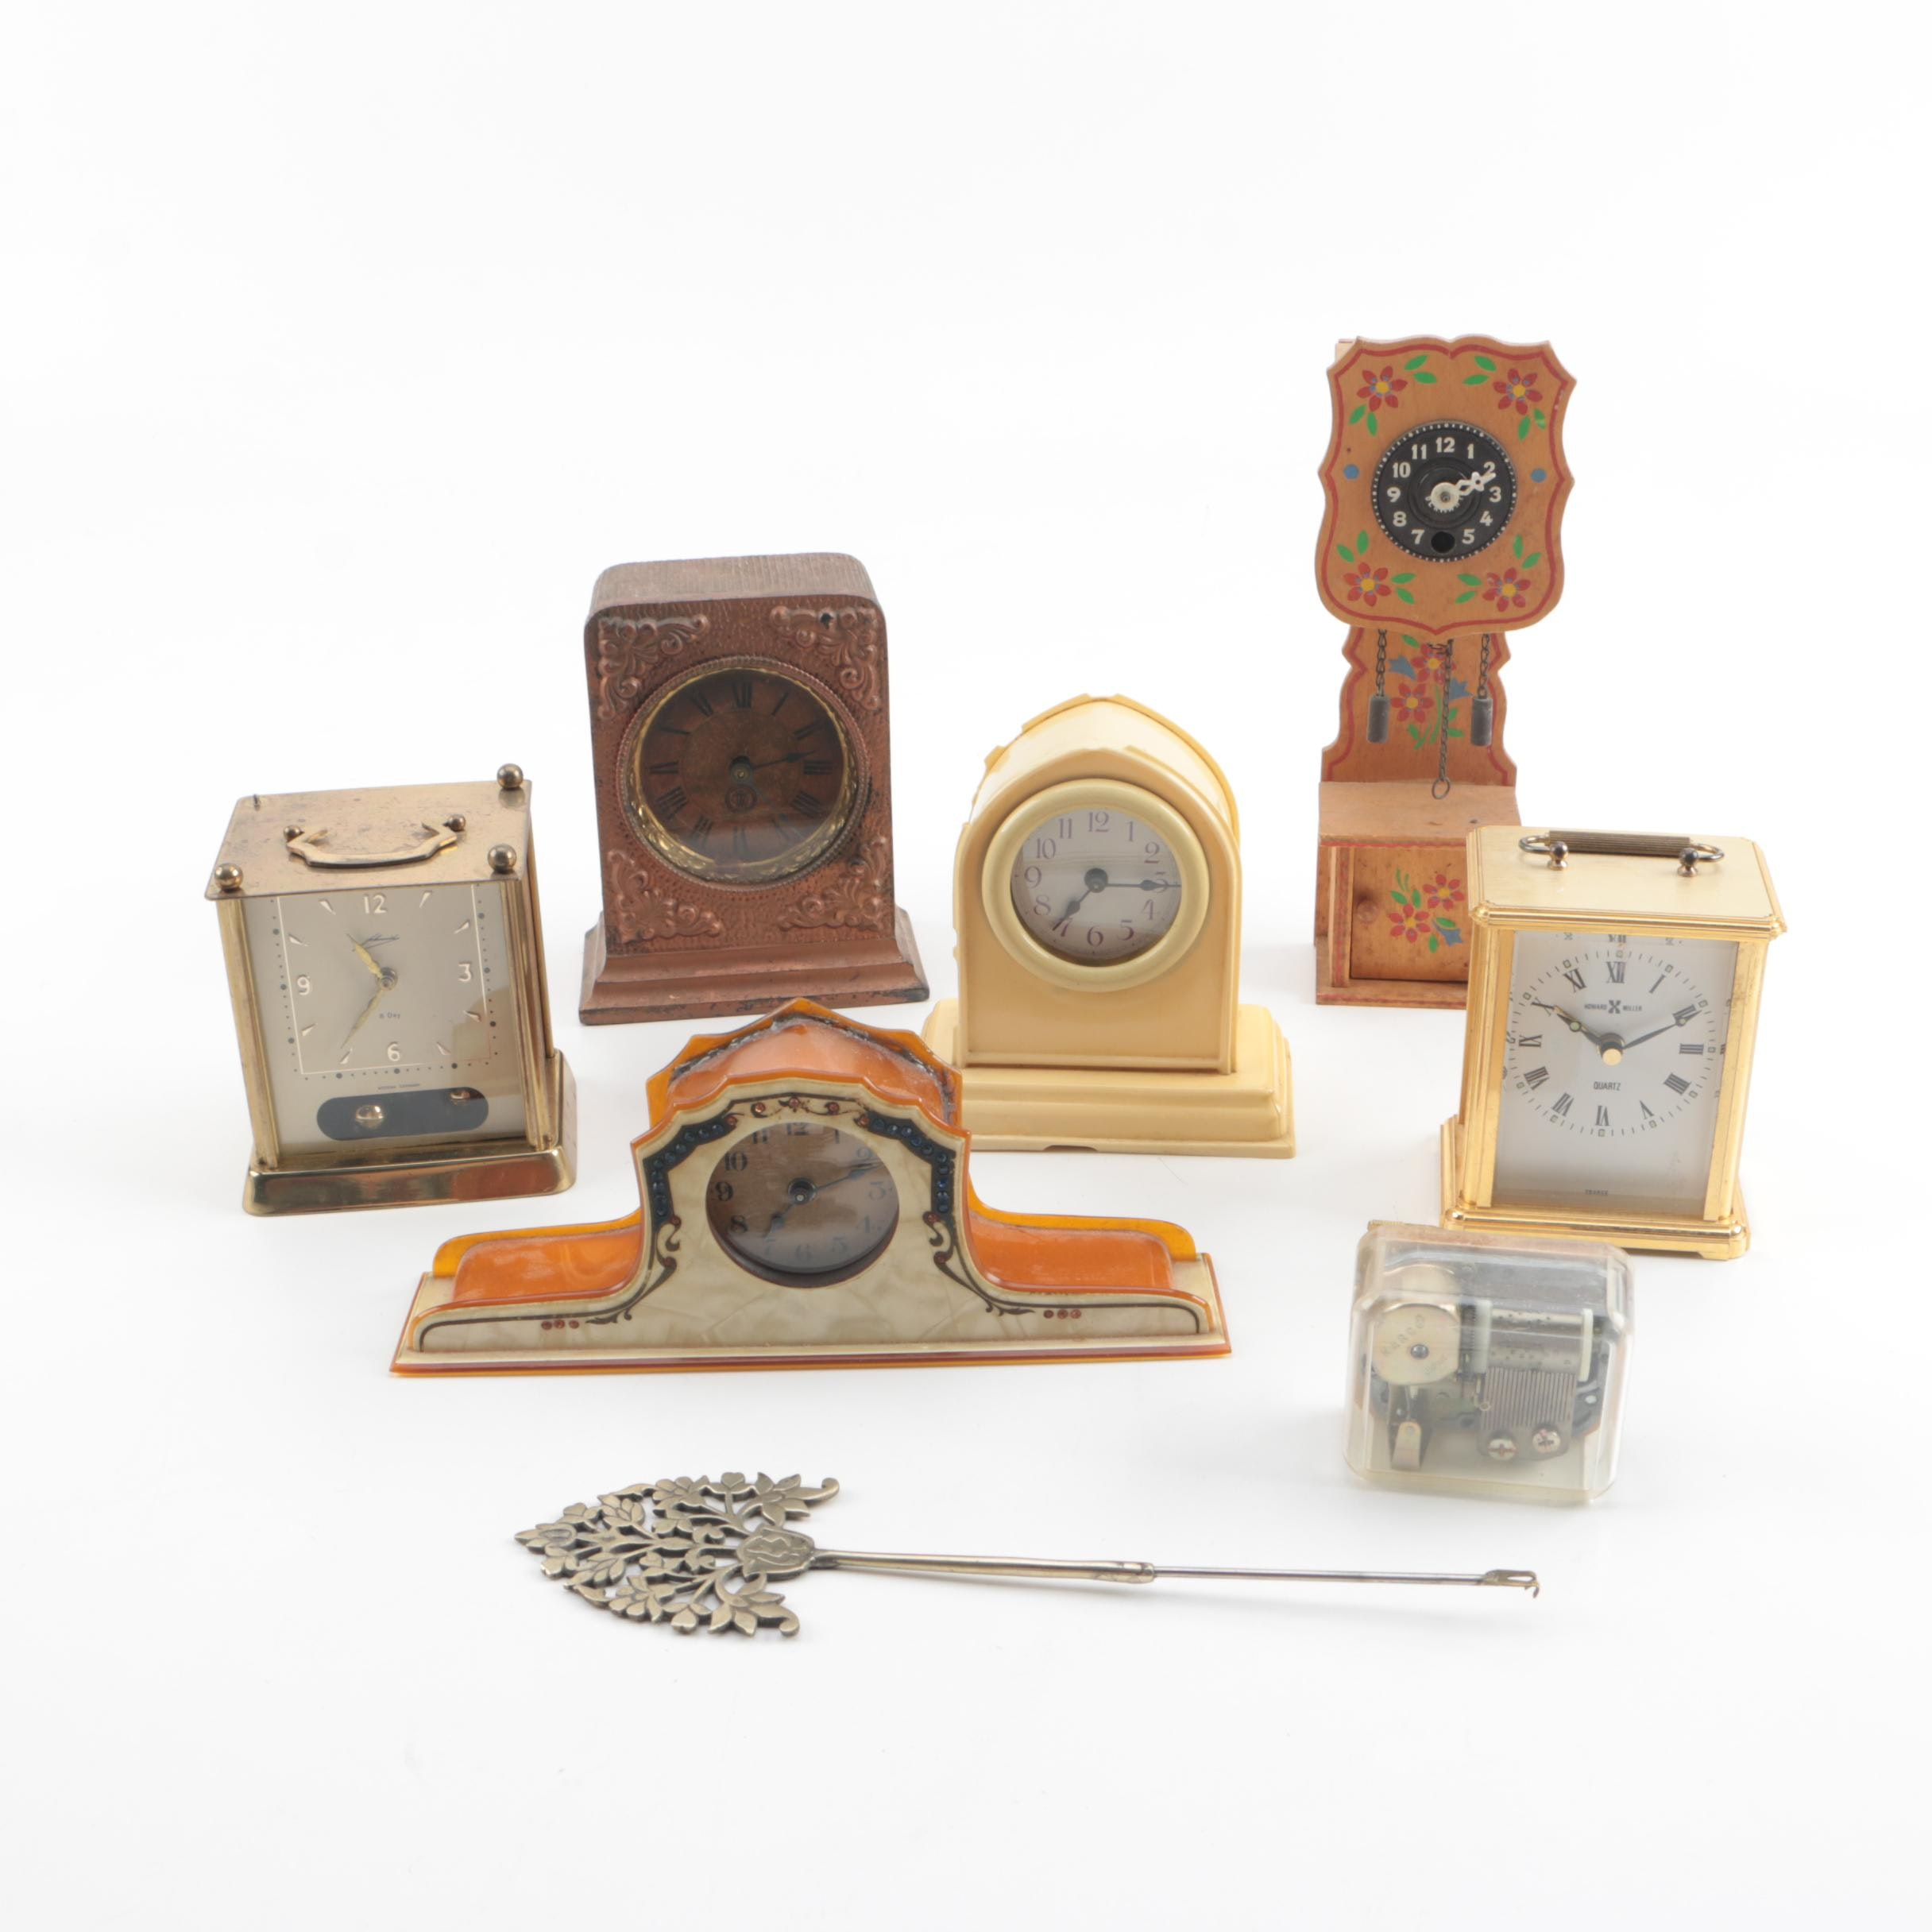 Vintage Shelf Clocks and Music Box